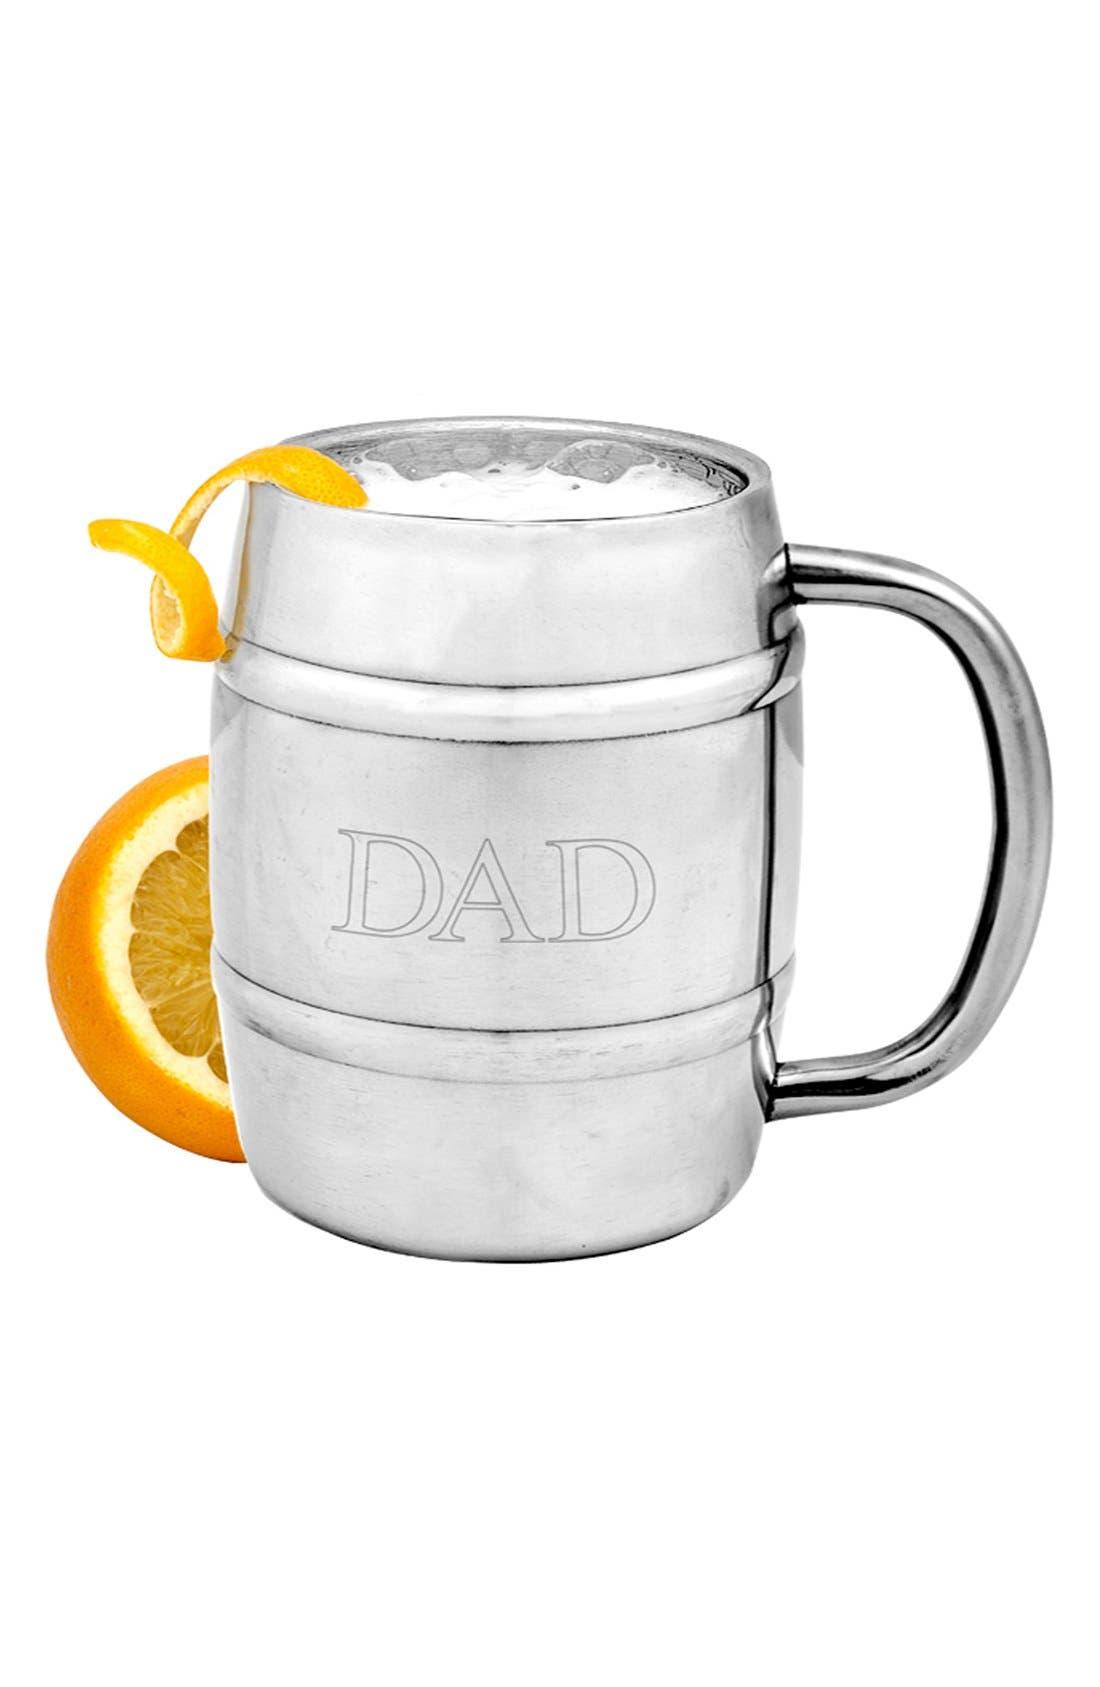 'Dad' Keg Mug,                         Main,                         color,